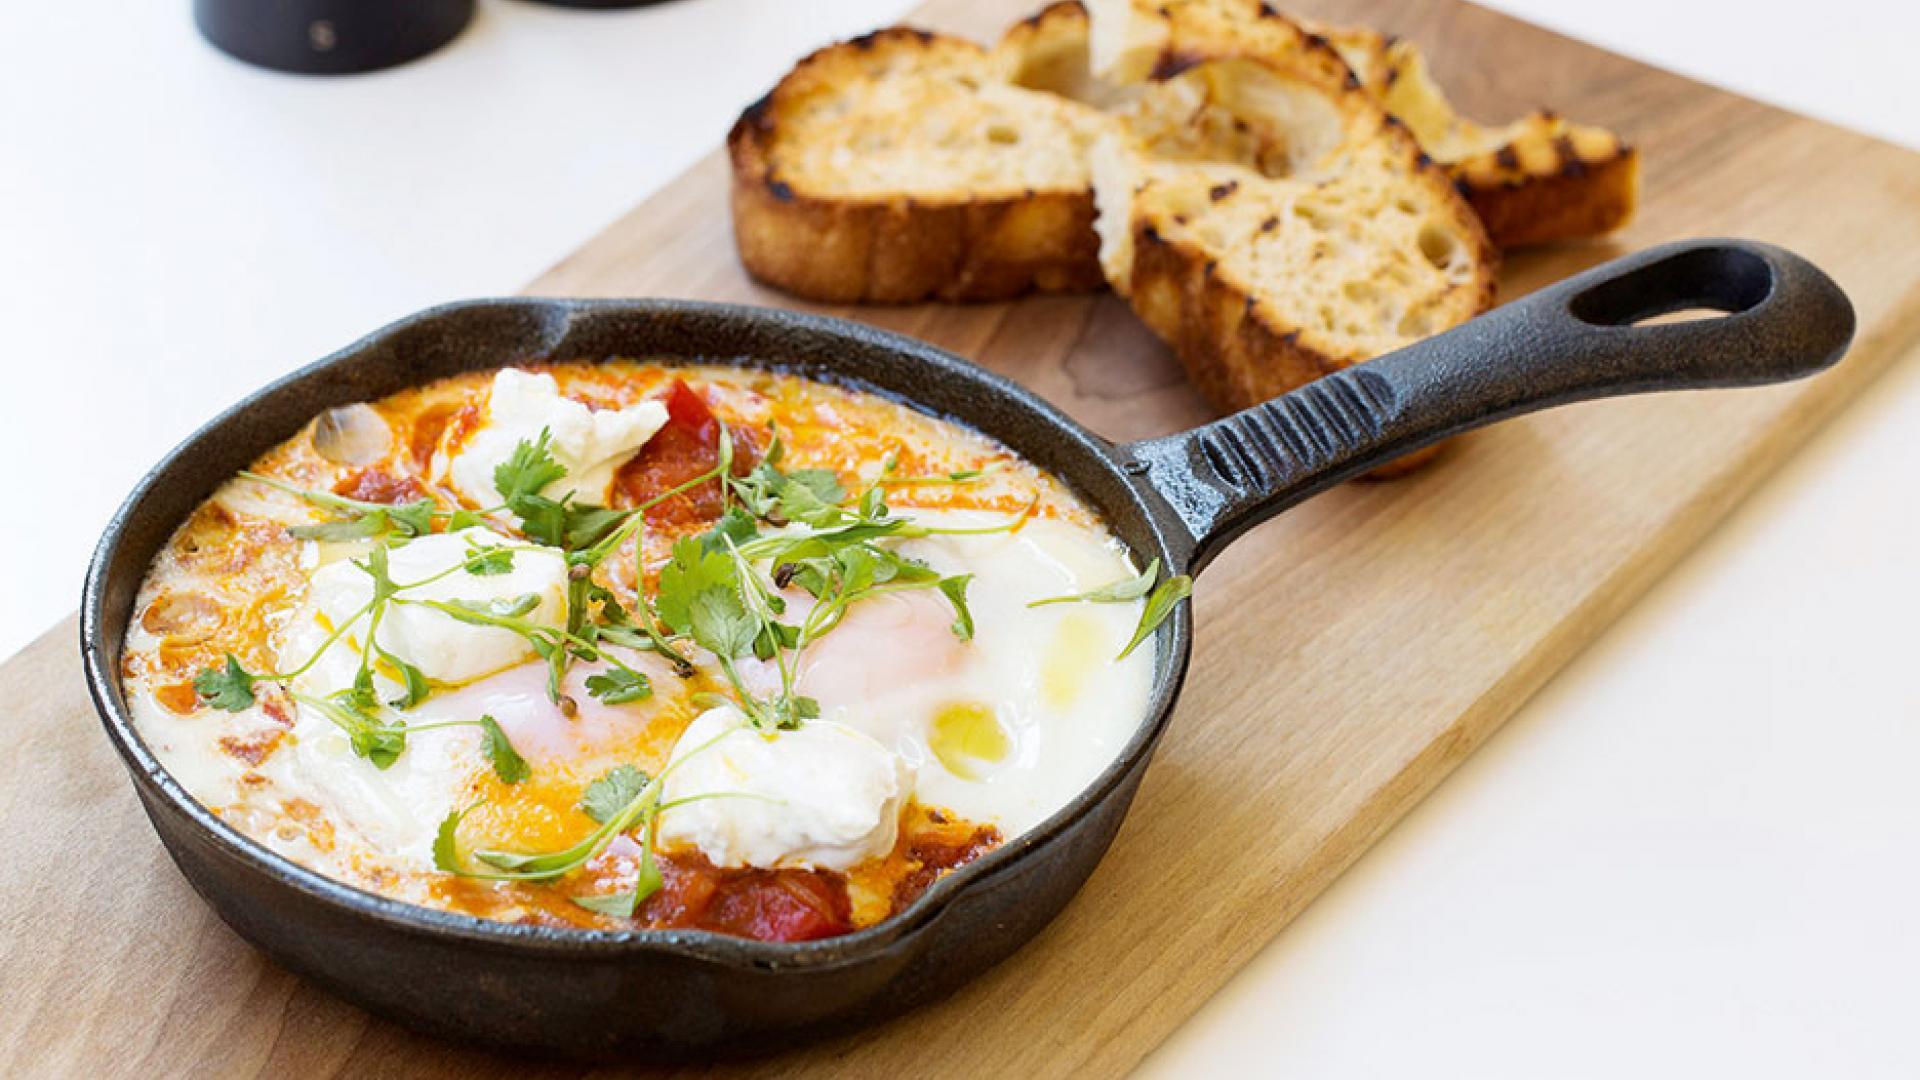 Best Vegetarian Restaurants in London: Ottolenghi